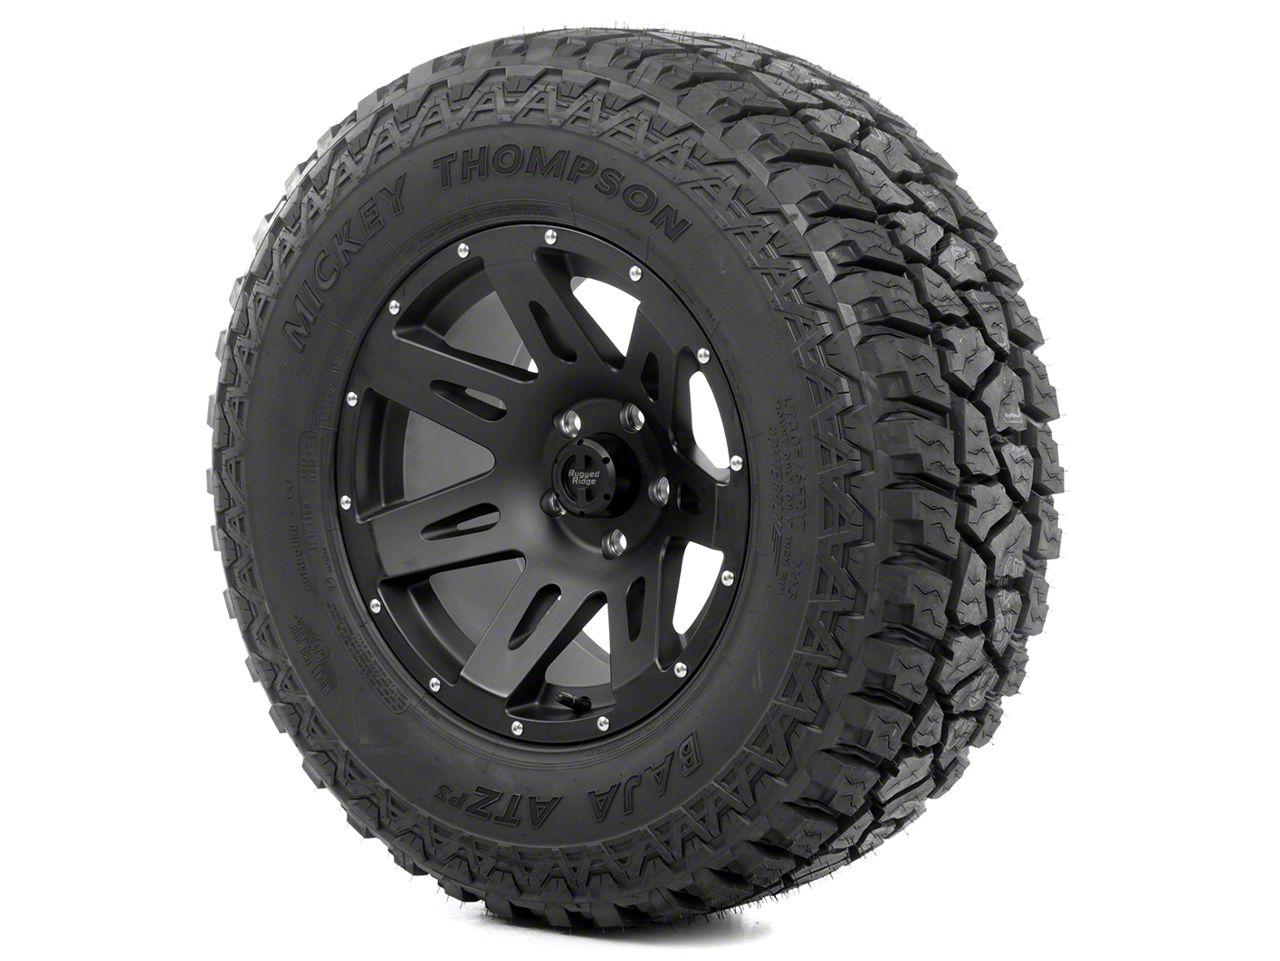 Rugged Ridge XHD Wheel 17x9 Black Satin and Mickey Thompson ATZ P3 305/65R17 Tire Kit (13-18 Jeep Wrangler JK; 2018 Jeep Wrangler JL)